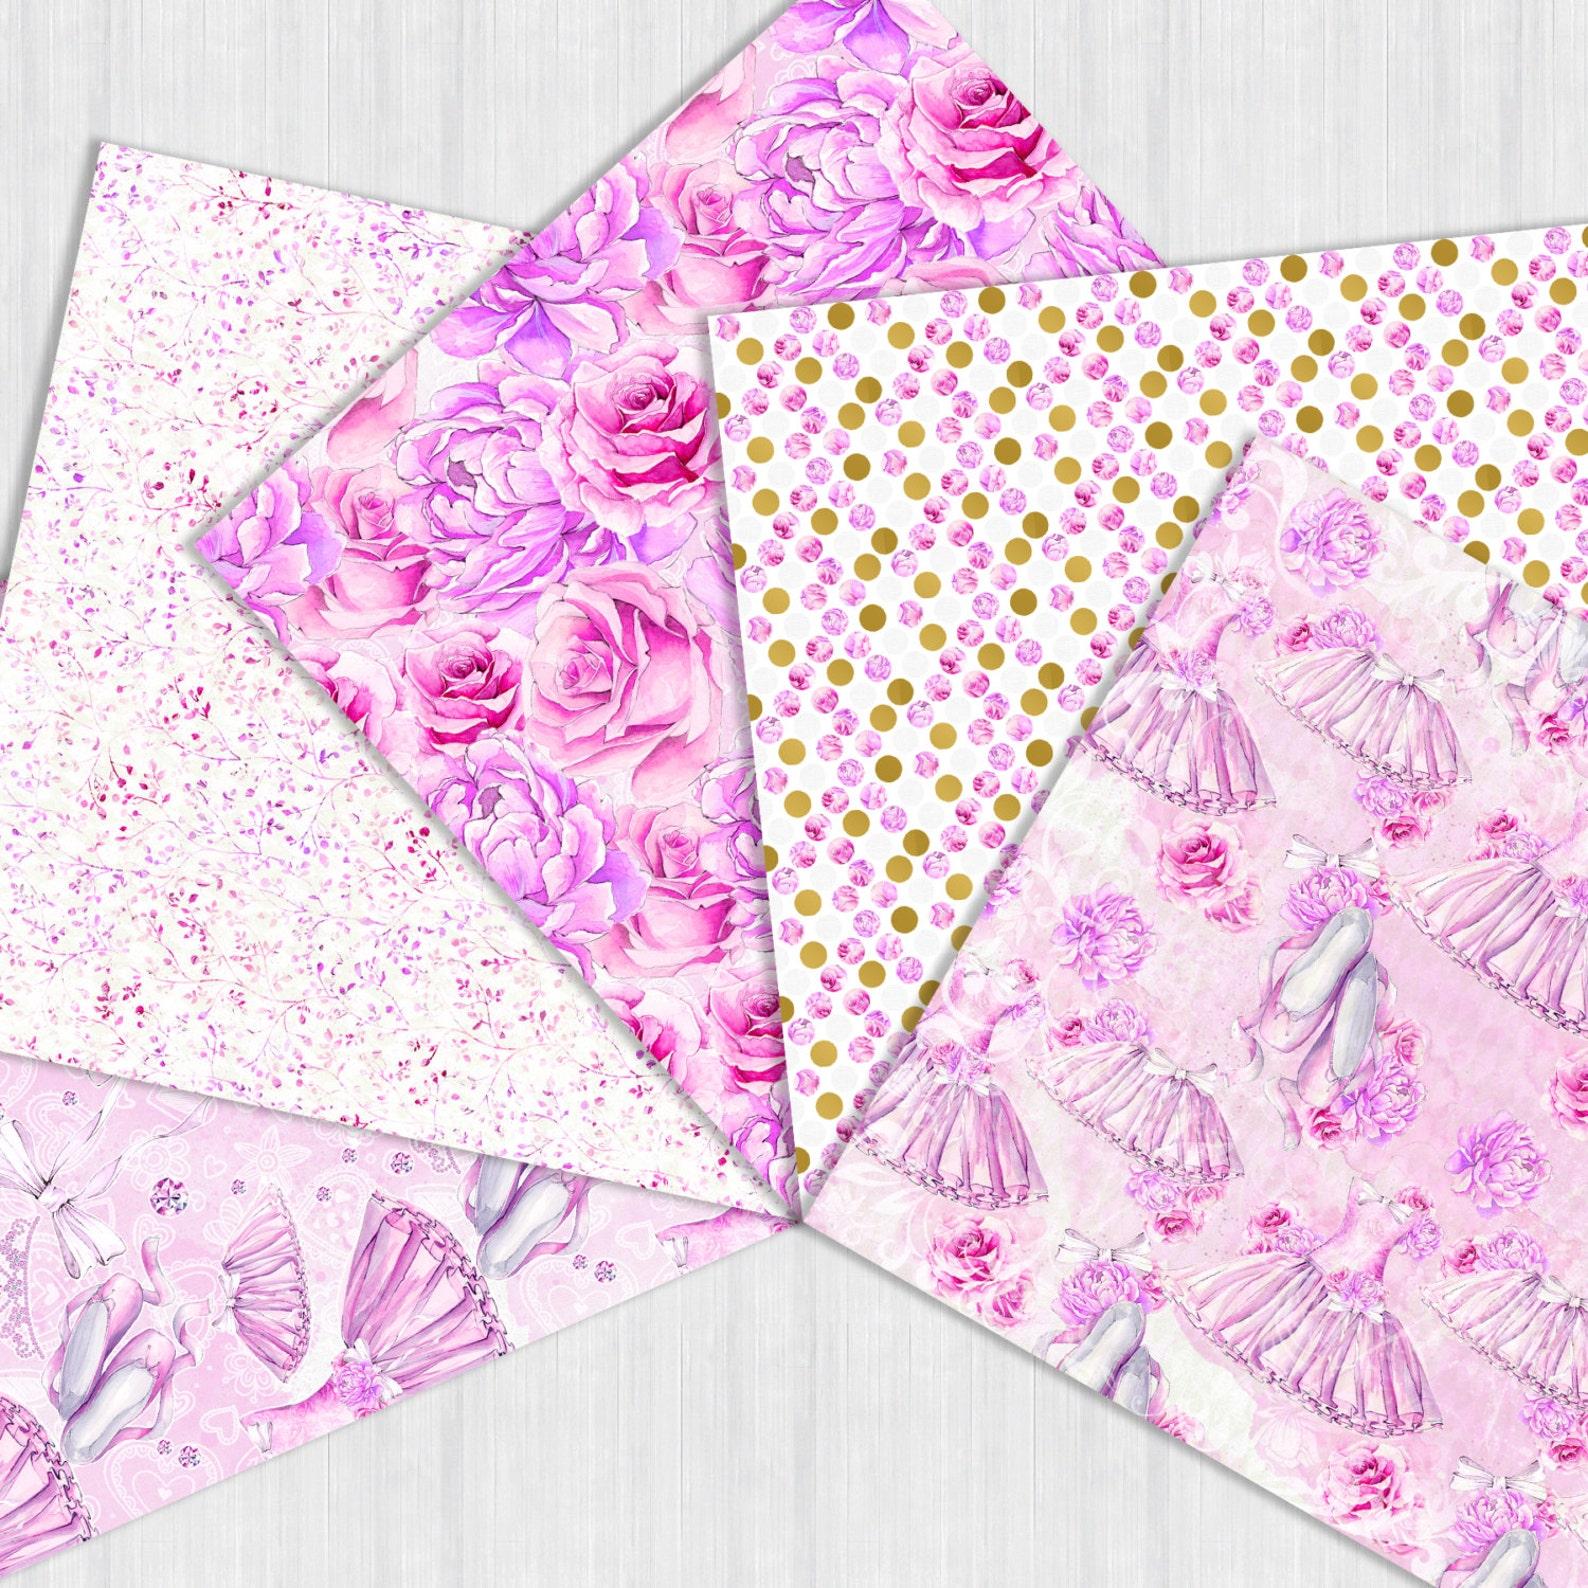 ballerina digital paper pack, ballet seamless patterns, watercolor ballet shoes, tutu dress, pink roses violet peonies, chick pr